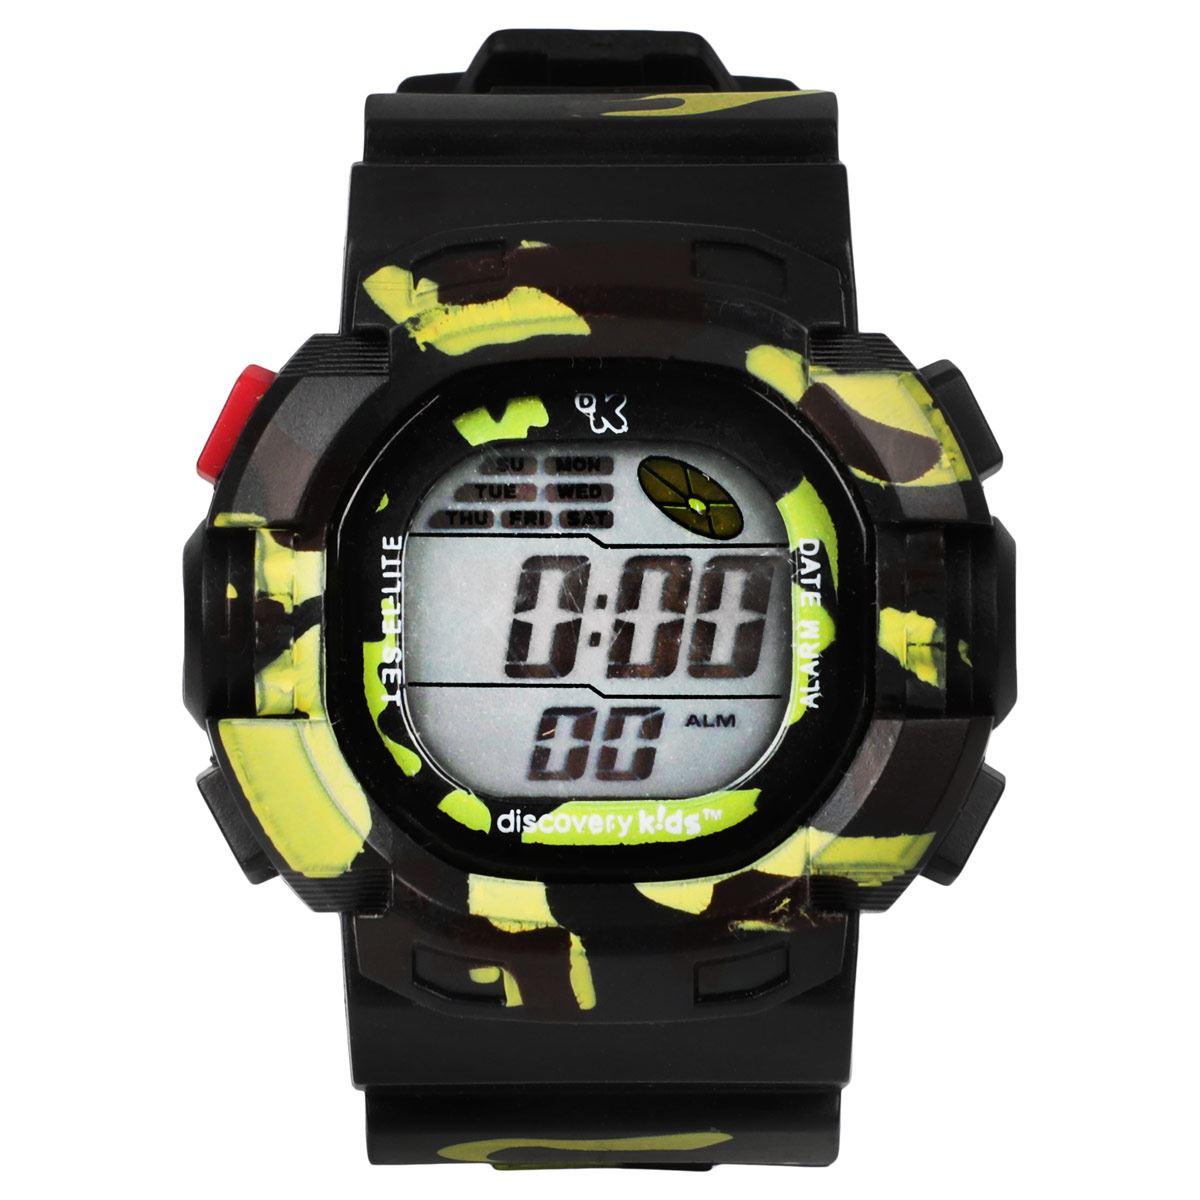 Reloj Digital para Niños DKID-607-1 Negro